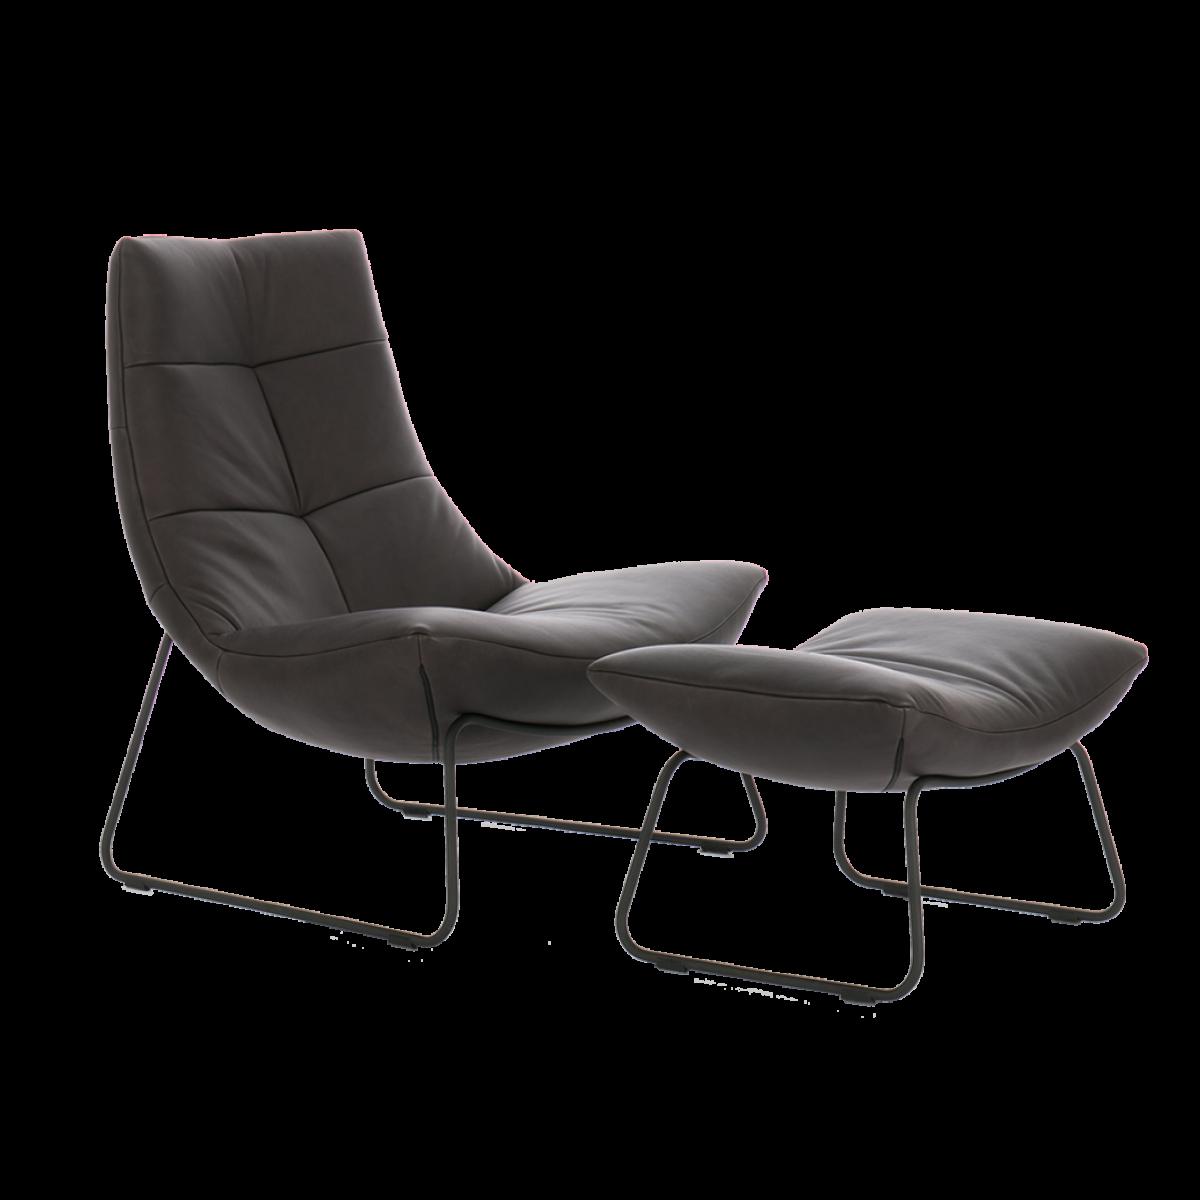 rebound-fauteuil-sledeframe-zwart-met-hocker